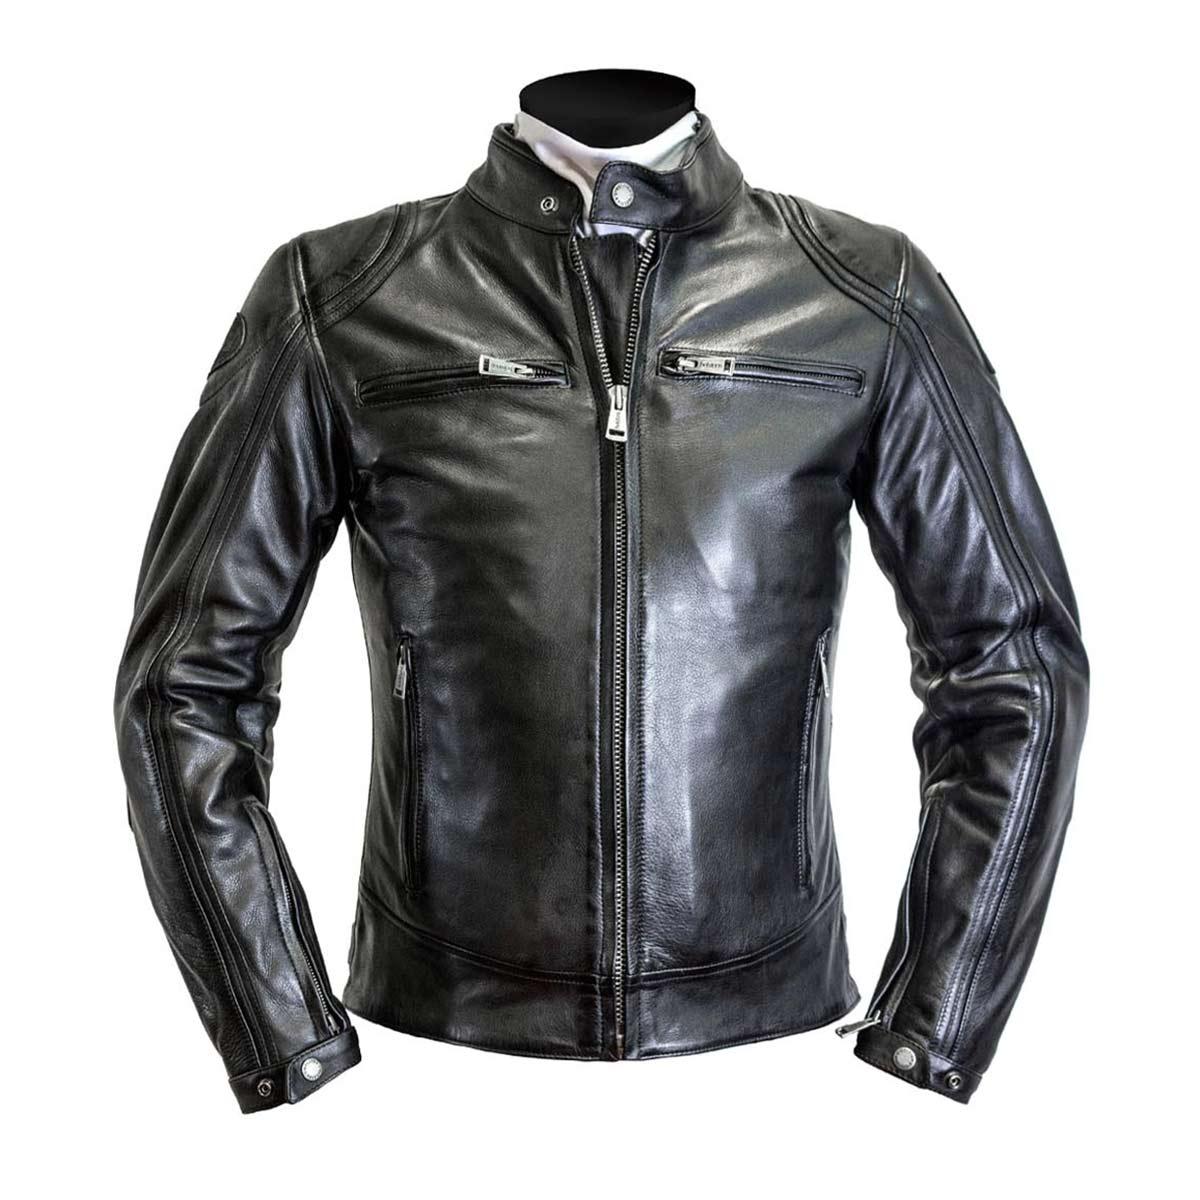 Helstons Modello Black Leather Jacket